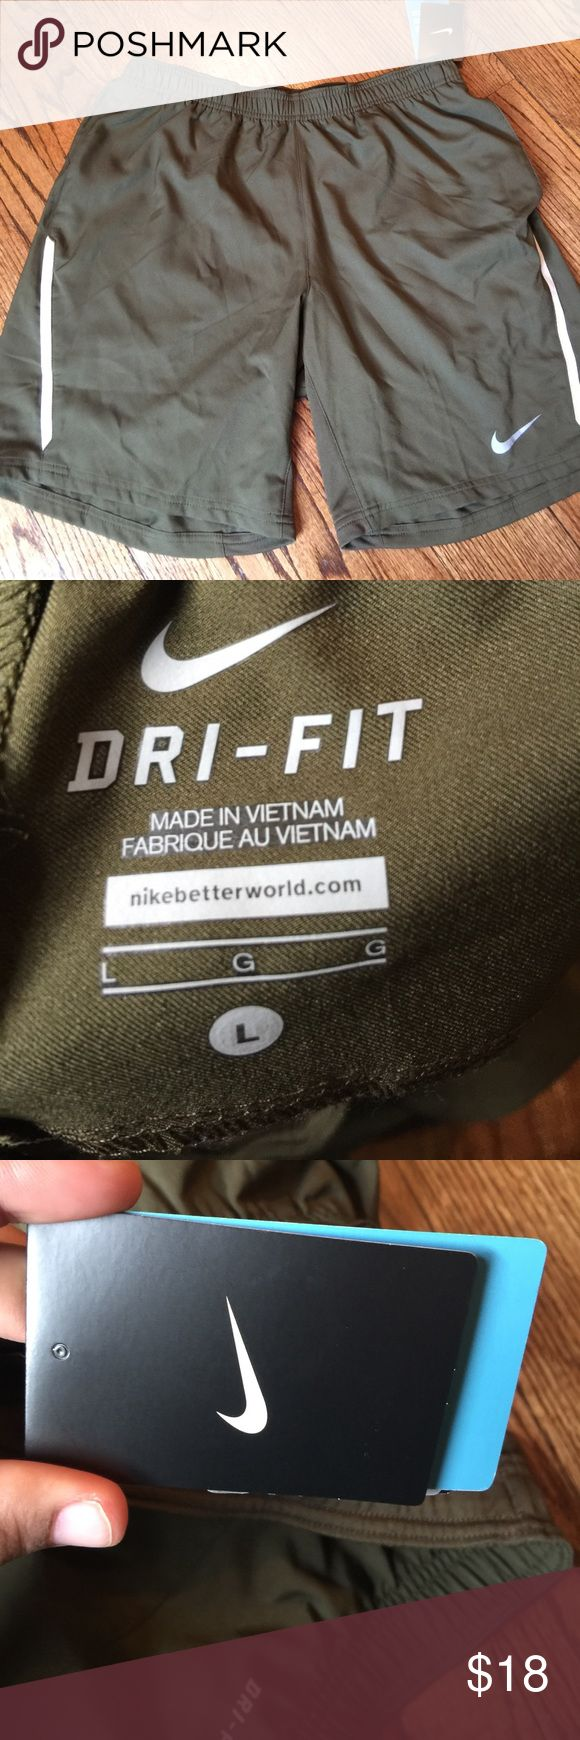 NWT Men's Nike dri fit shorts size large green NWT Nike dri fit shorts. Army green in color. Nike Shorts Athletic